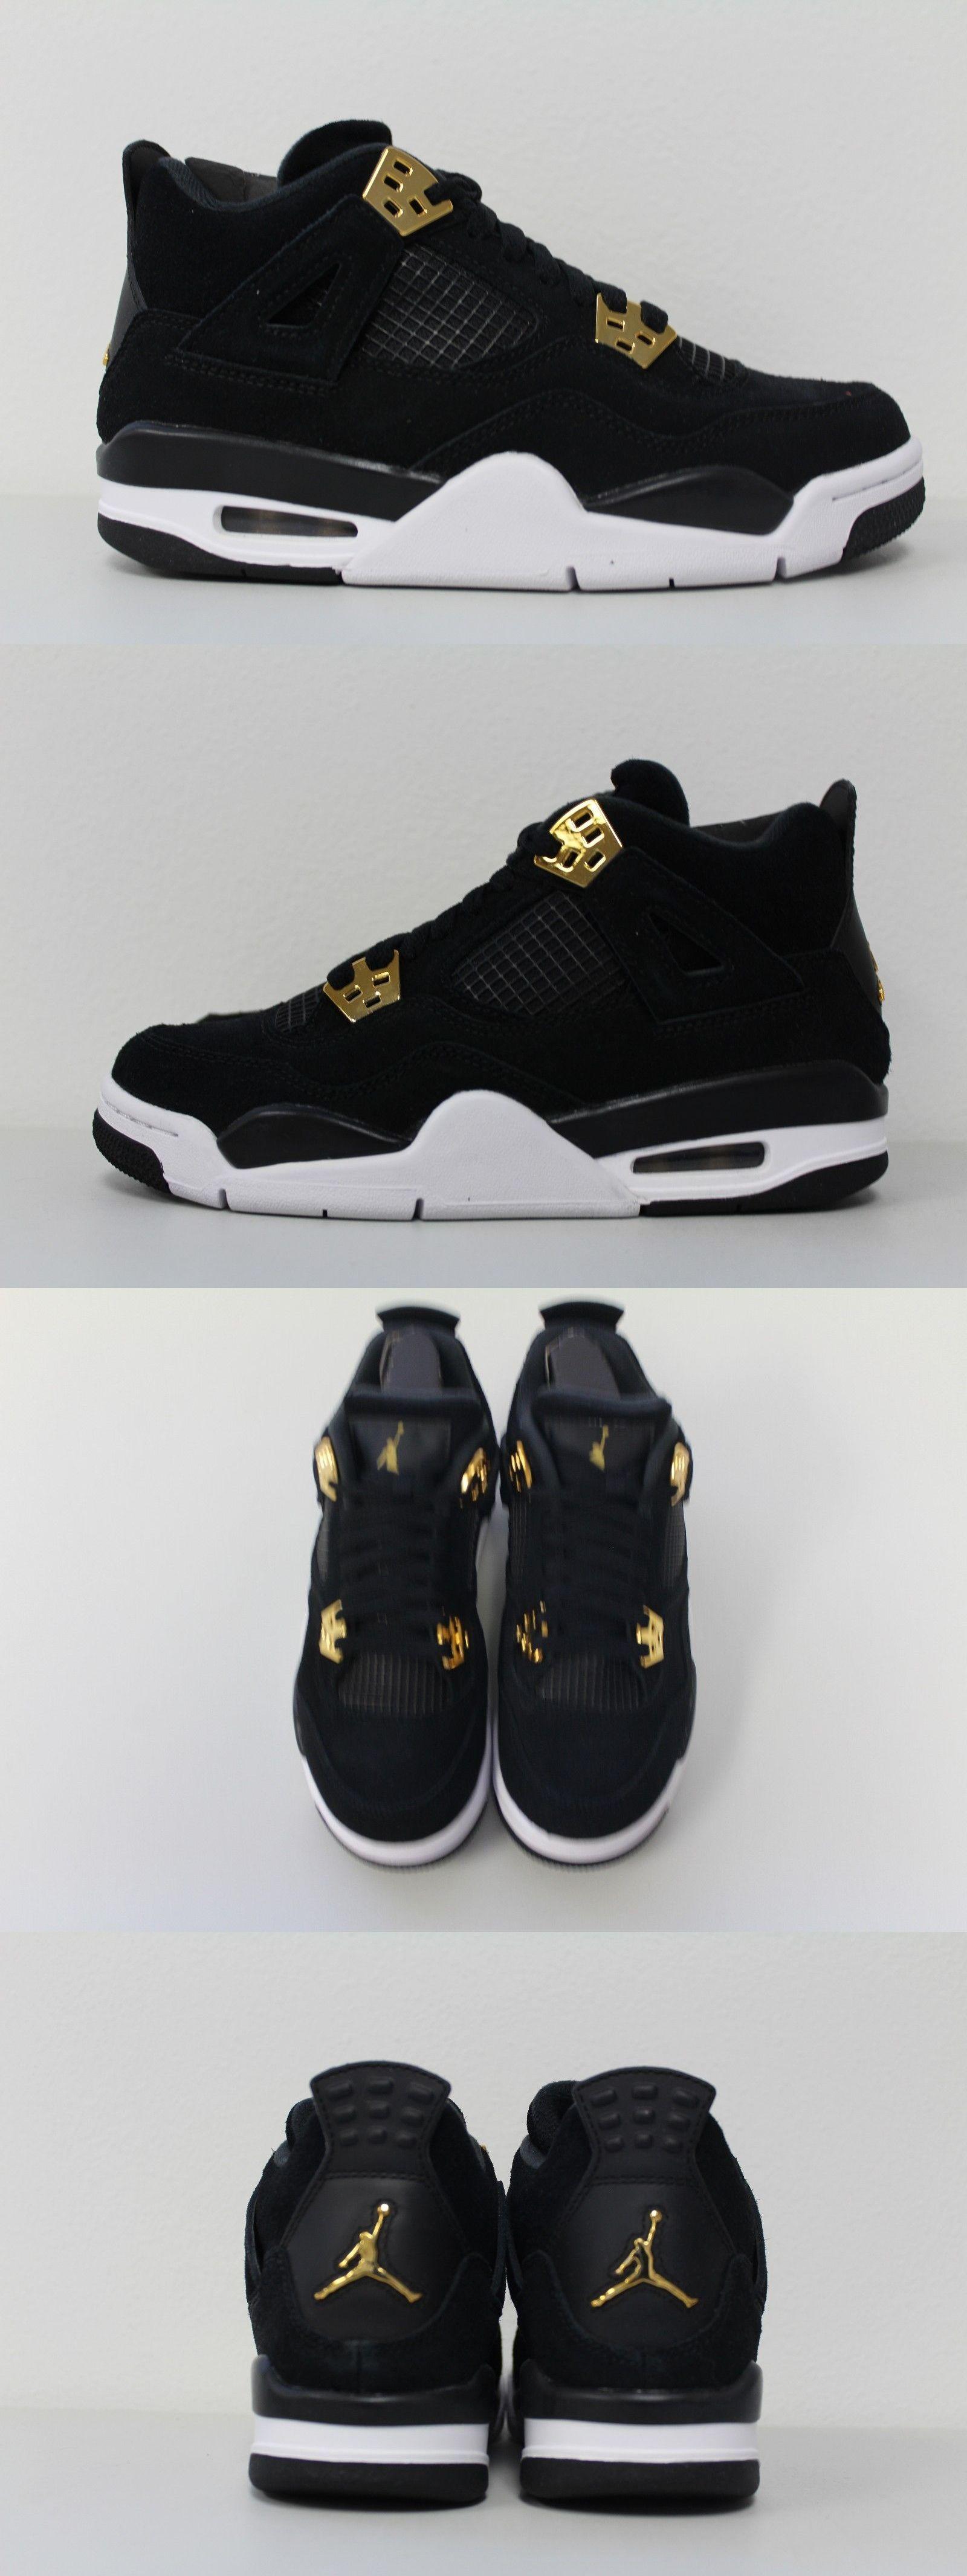 29a5520d66e Unisex Shoes 155202  Youth Nike Air Jordan Retro 4 Royalty Black Metallic  Gold Gs 408452-032 Sz 6Y -  BUY IT NOW ONLY   139.99 on eBay!